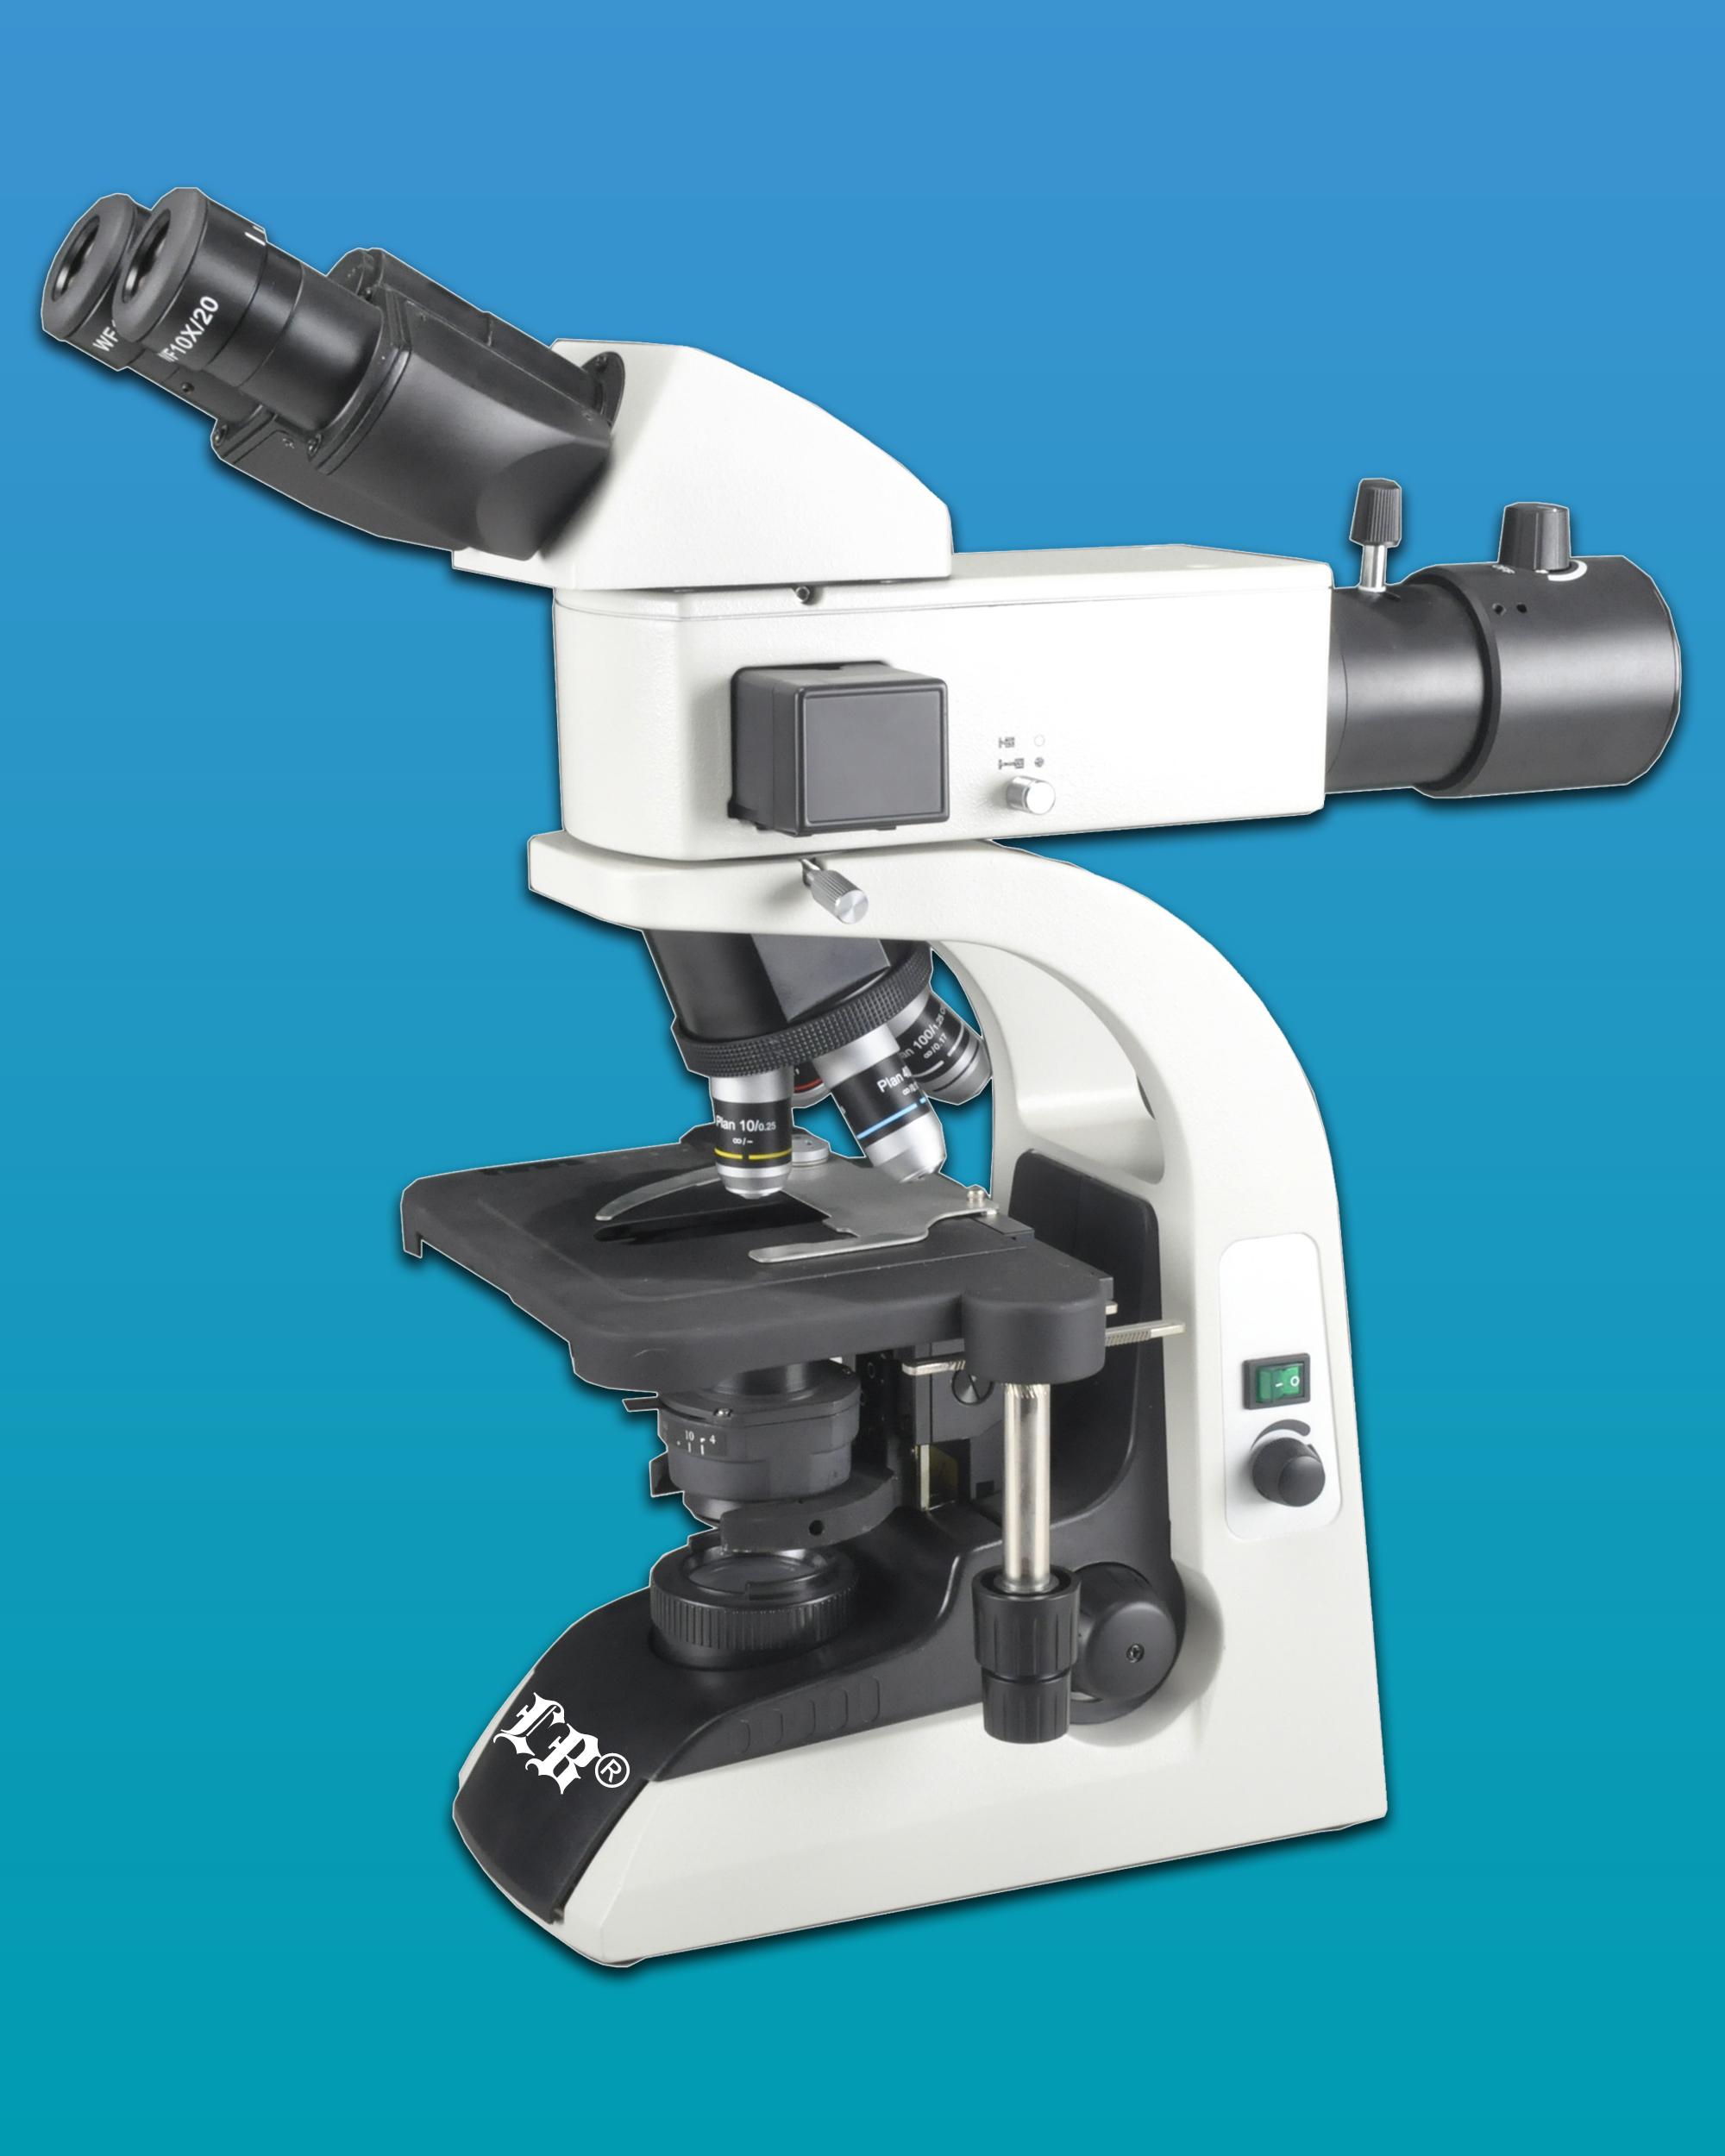 [LB-274] Binocular LED Fluorescent Biological Microscope & Abbe Condenser (Anti-Fungus)